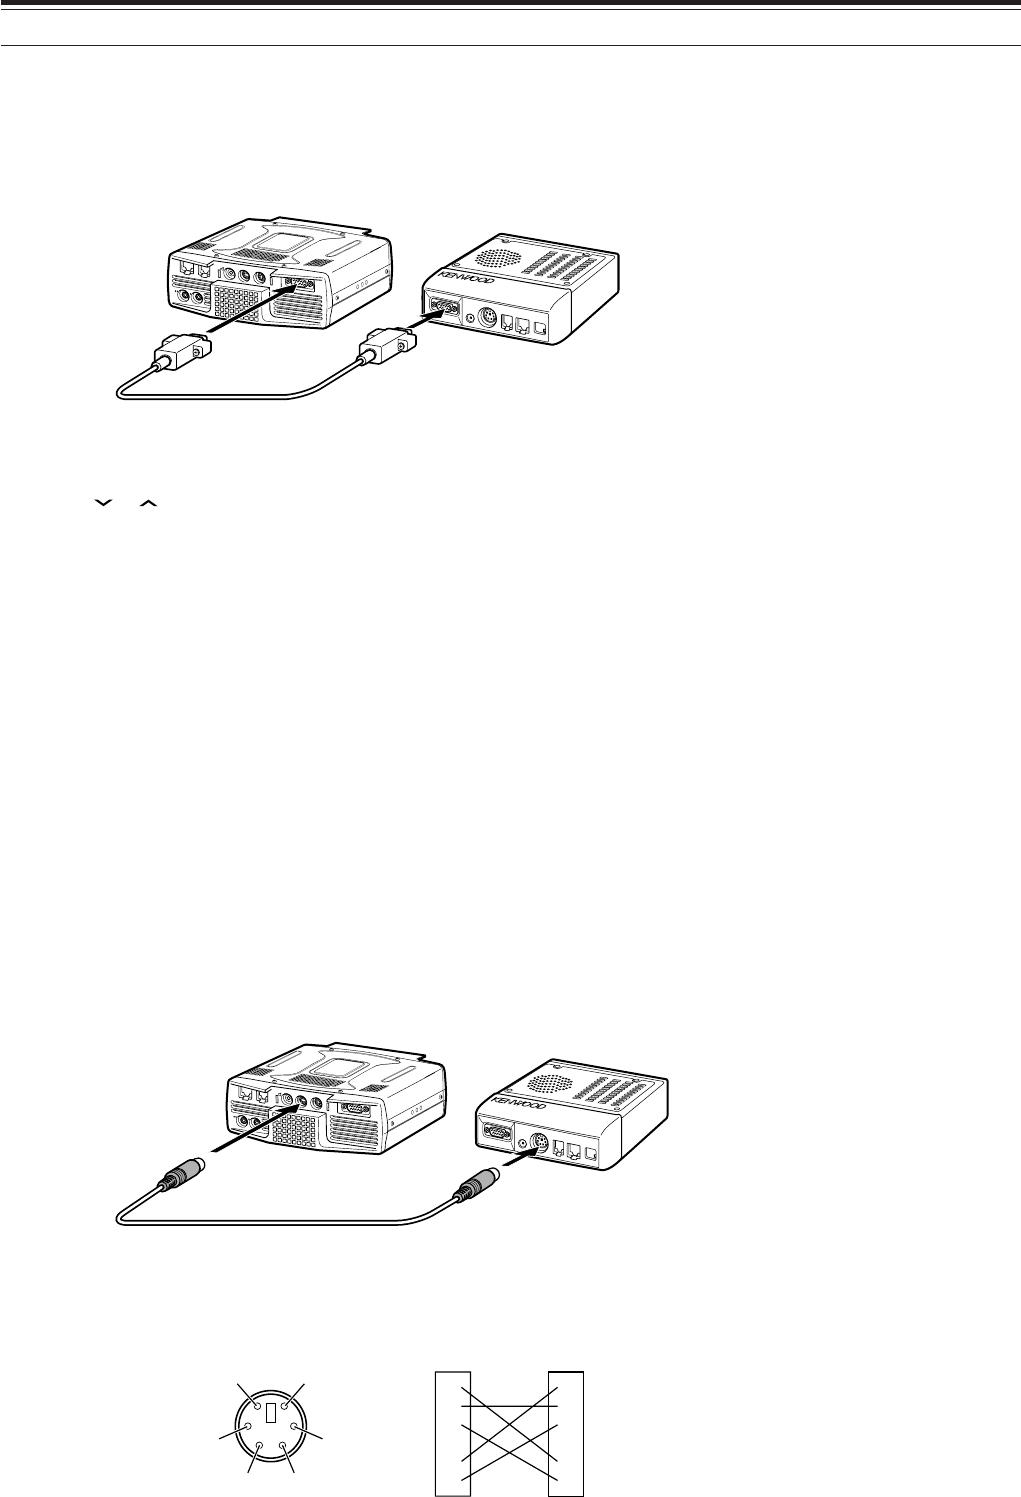 handleiding kenwood ts 480sat pagina 87 van 104 english Kenwood KT 615 Tuner 79